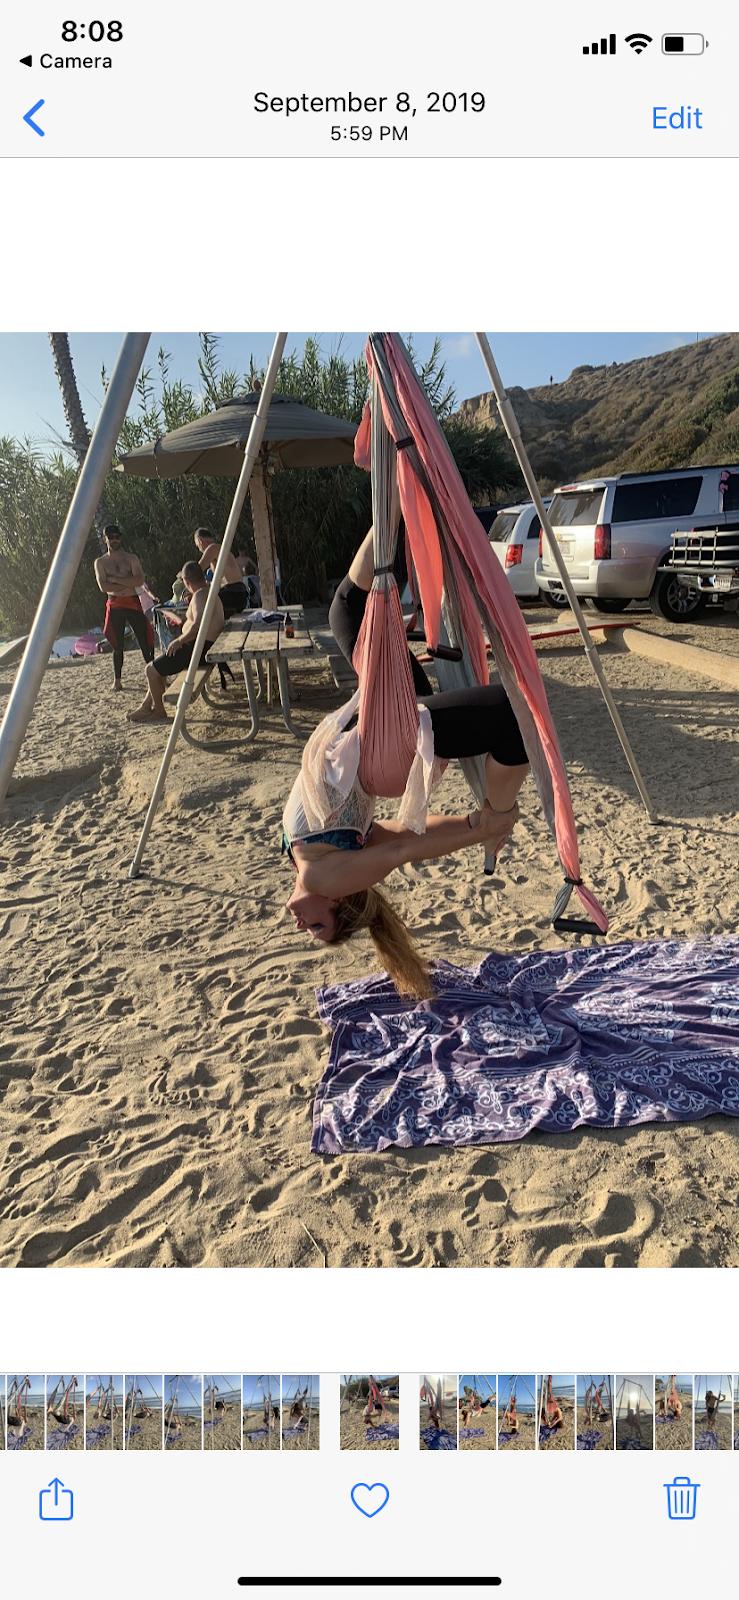 Yoga Trapeze Orange County - school    Photo 10 of 10   Address: 815 N San Pablo Ct, Long Beach, CA 90813, USA   Phone: (949) 324-6918